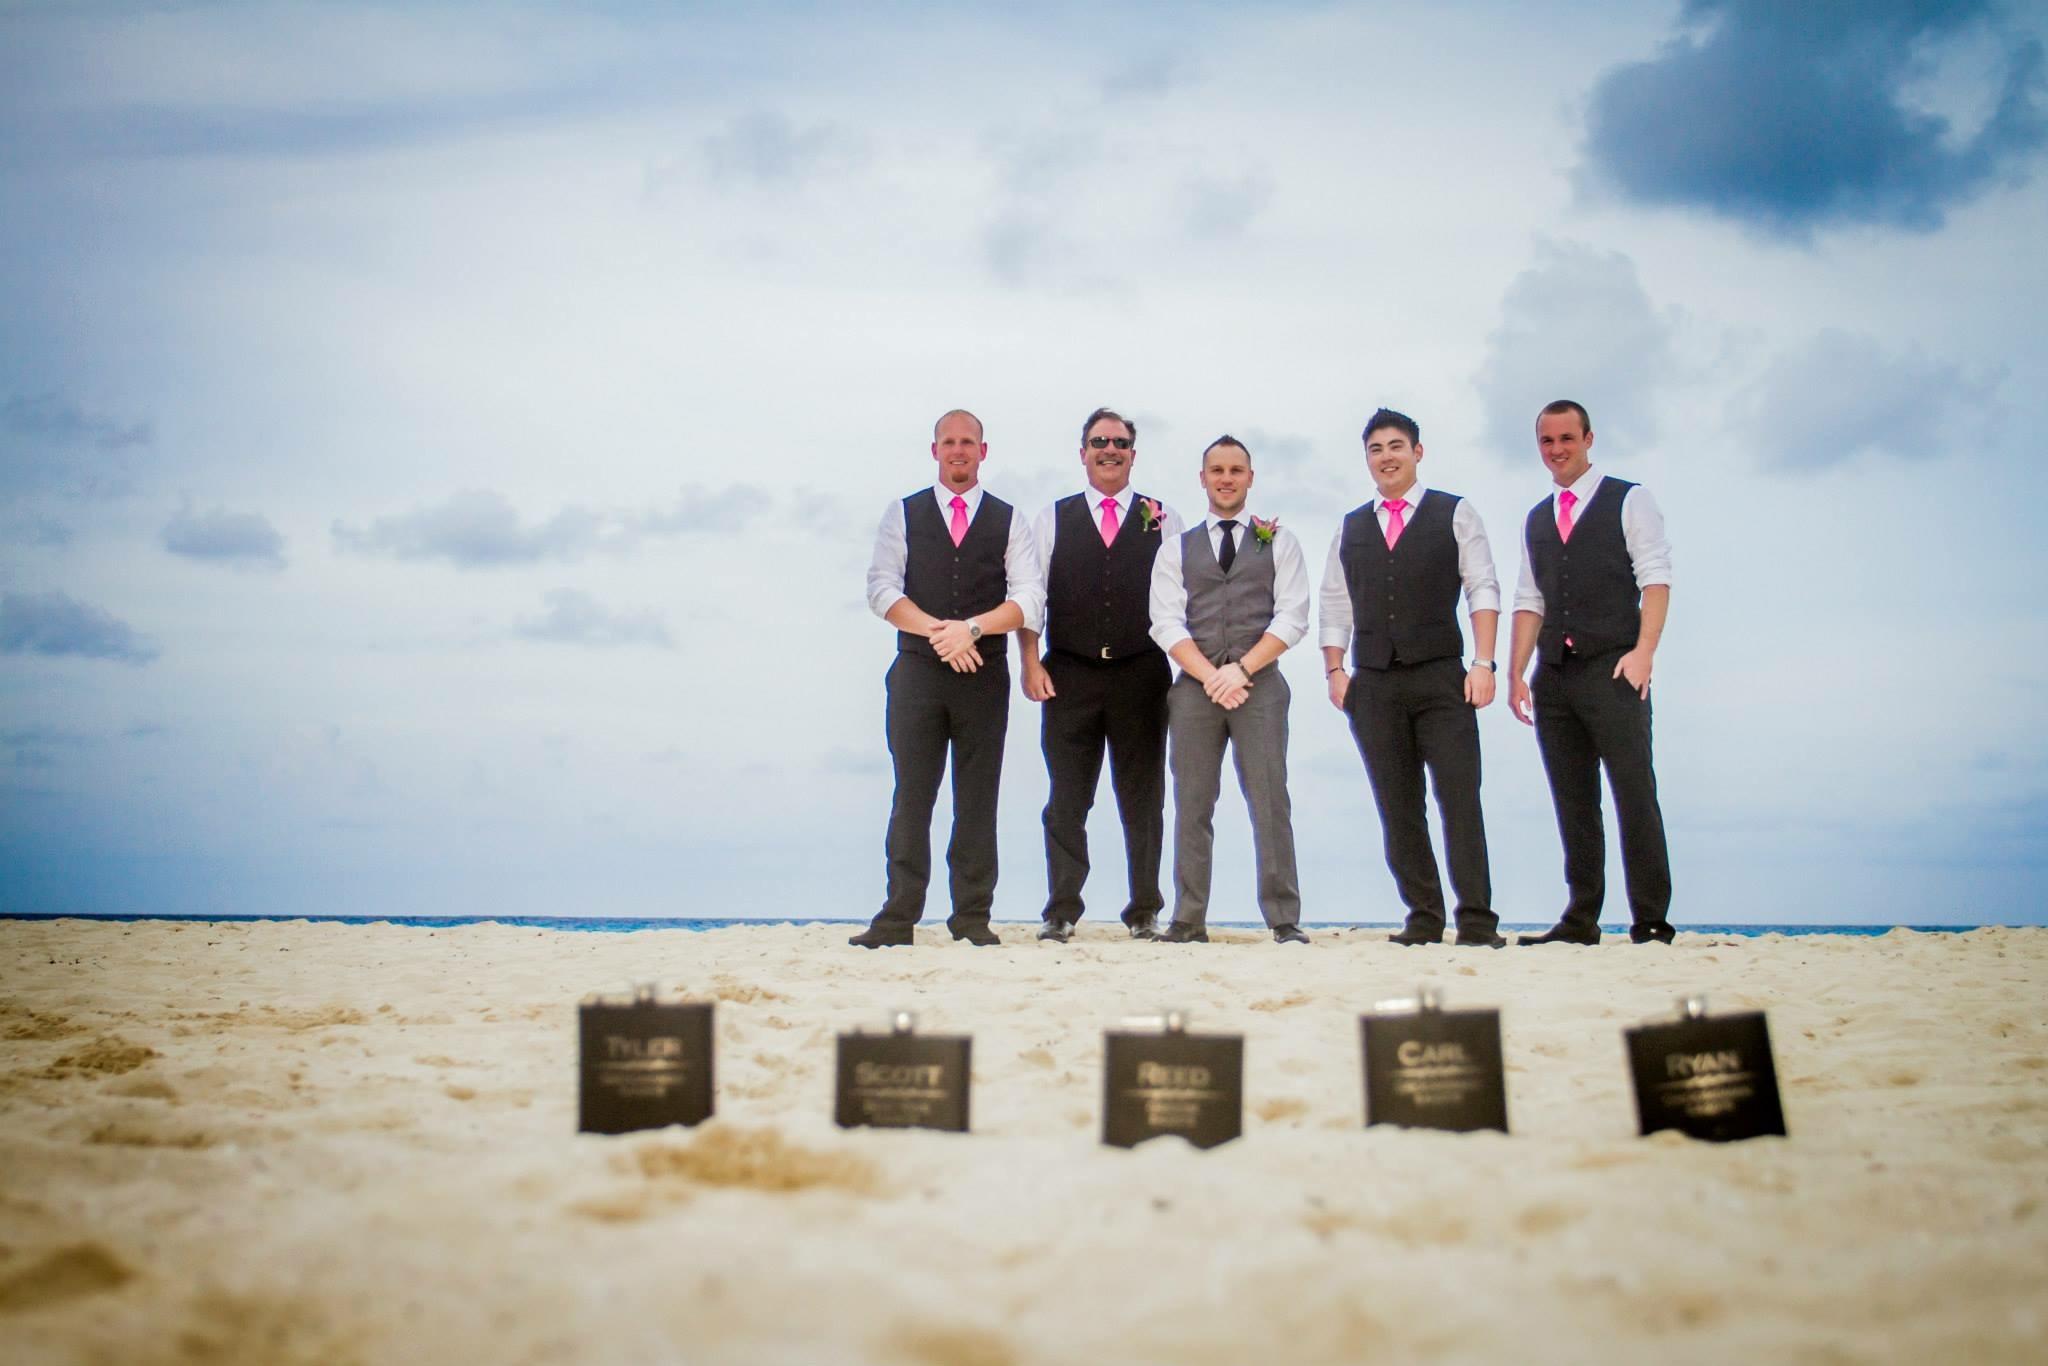 krysten-reed-cancun-beach-wedding-7.JPG